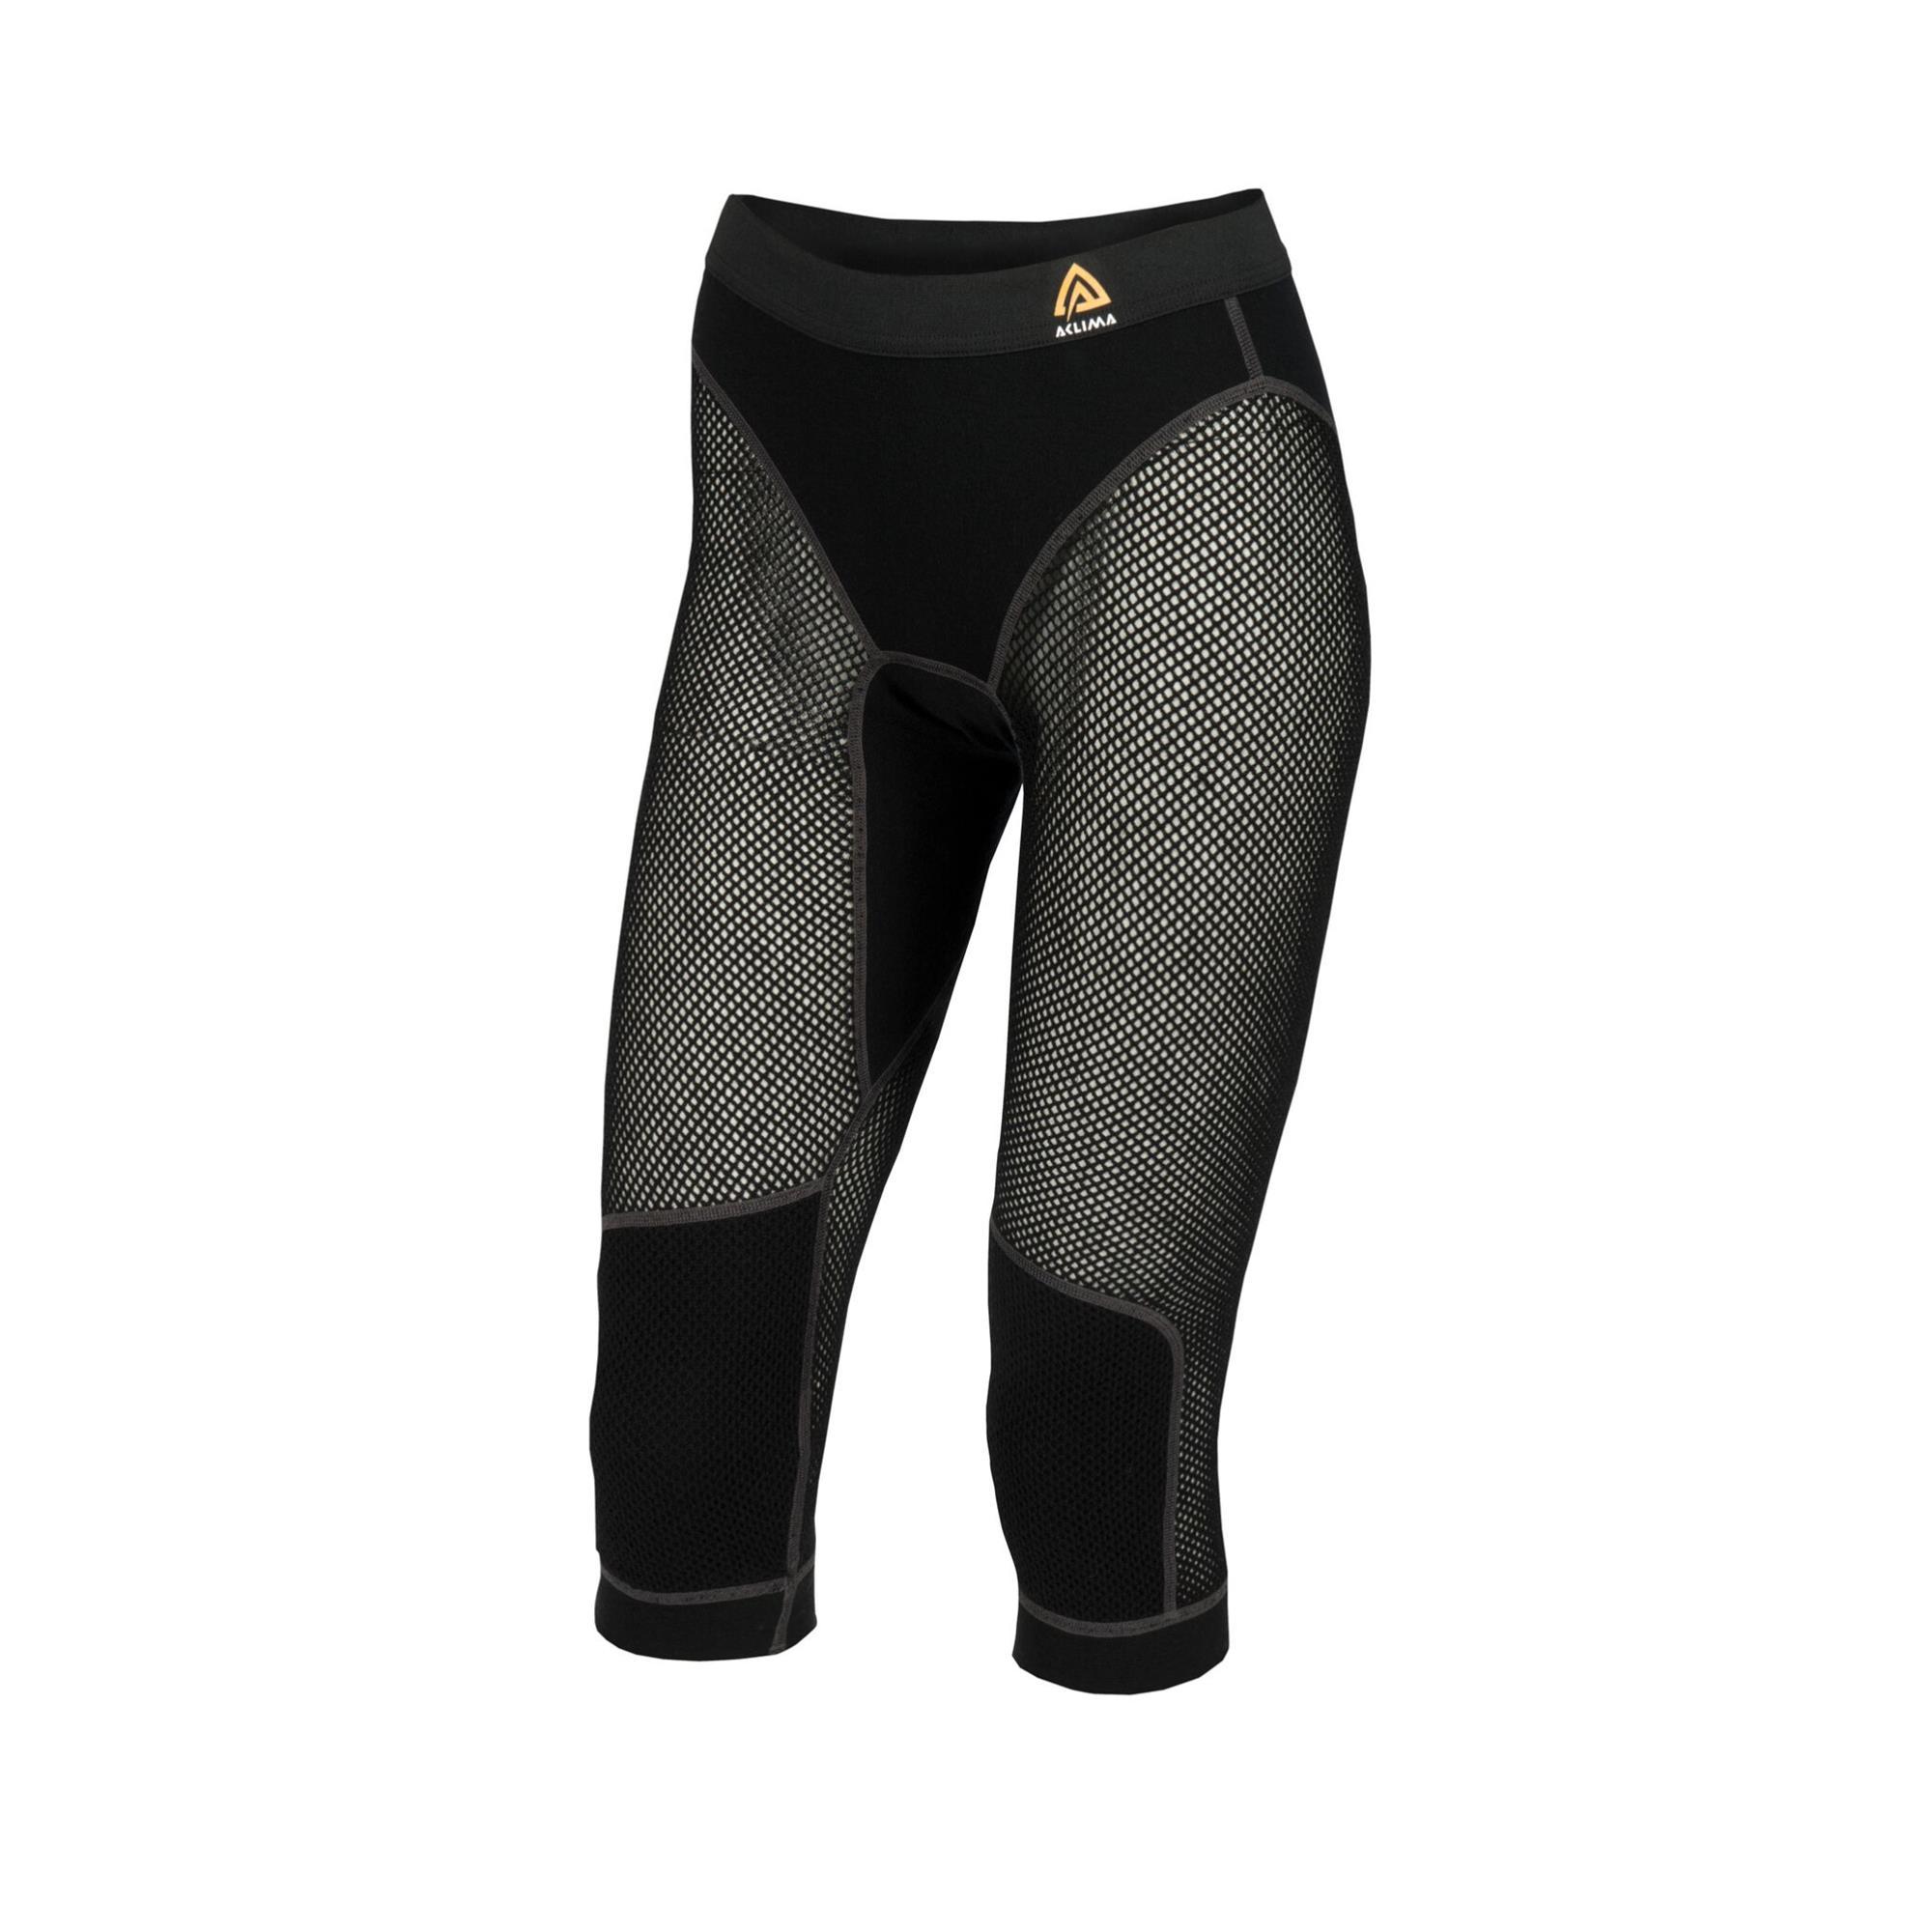 Aclima Woolnet 3/4 Long Pants Damen Funktionsunterhose schwarz Gr. M